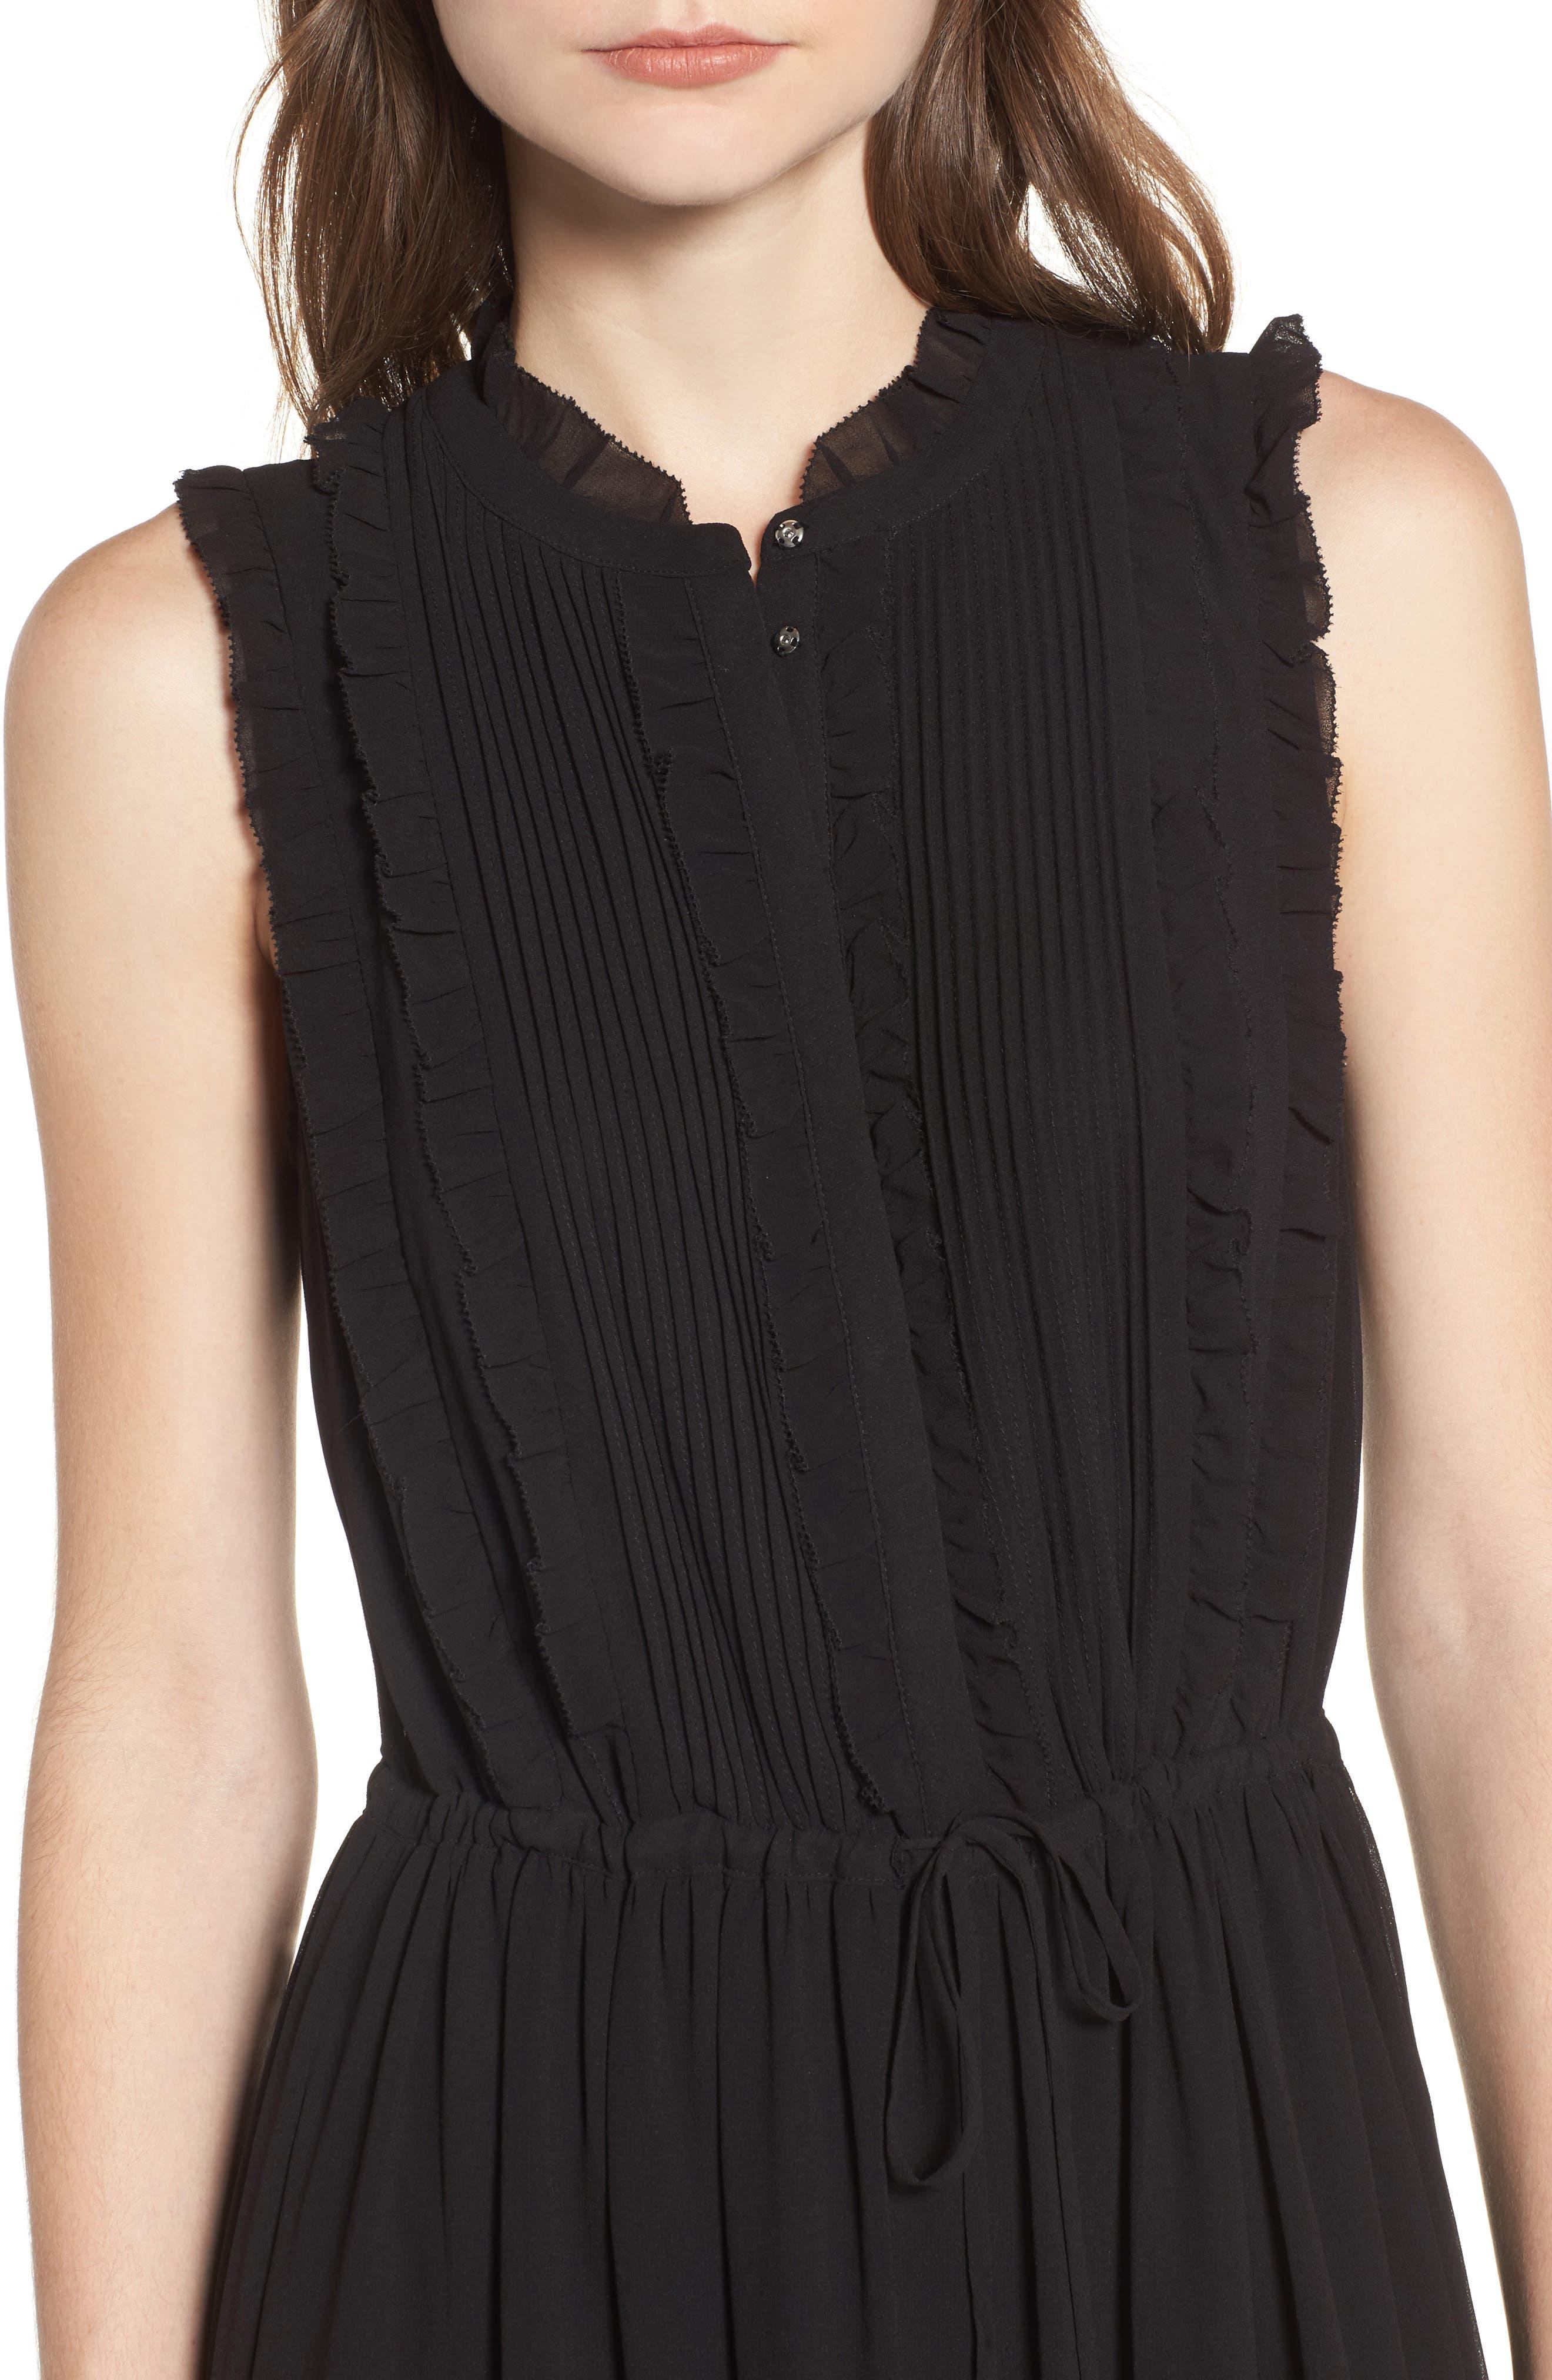 Ami Maxi Dress,                             Alternate thumbnail 4, color,                             Black